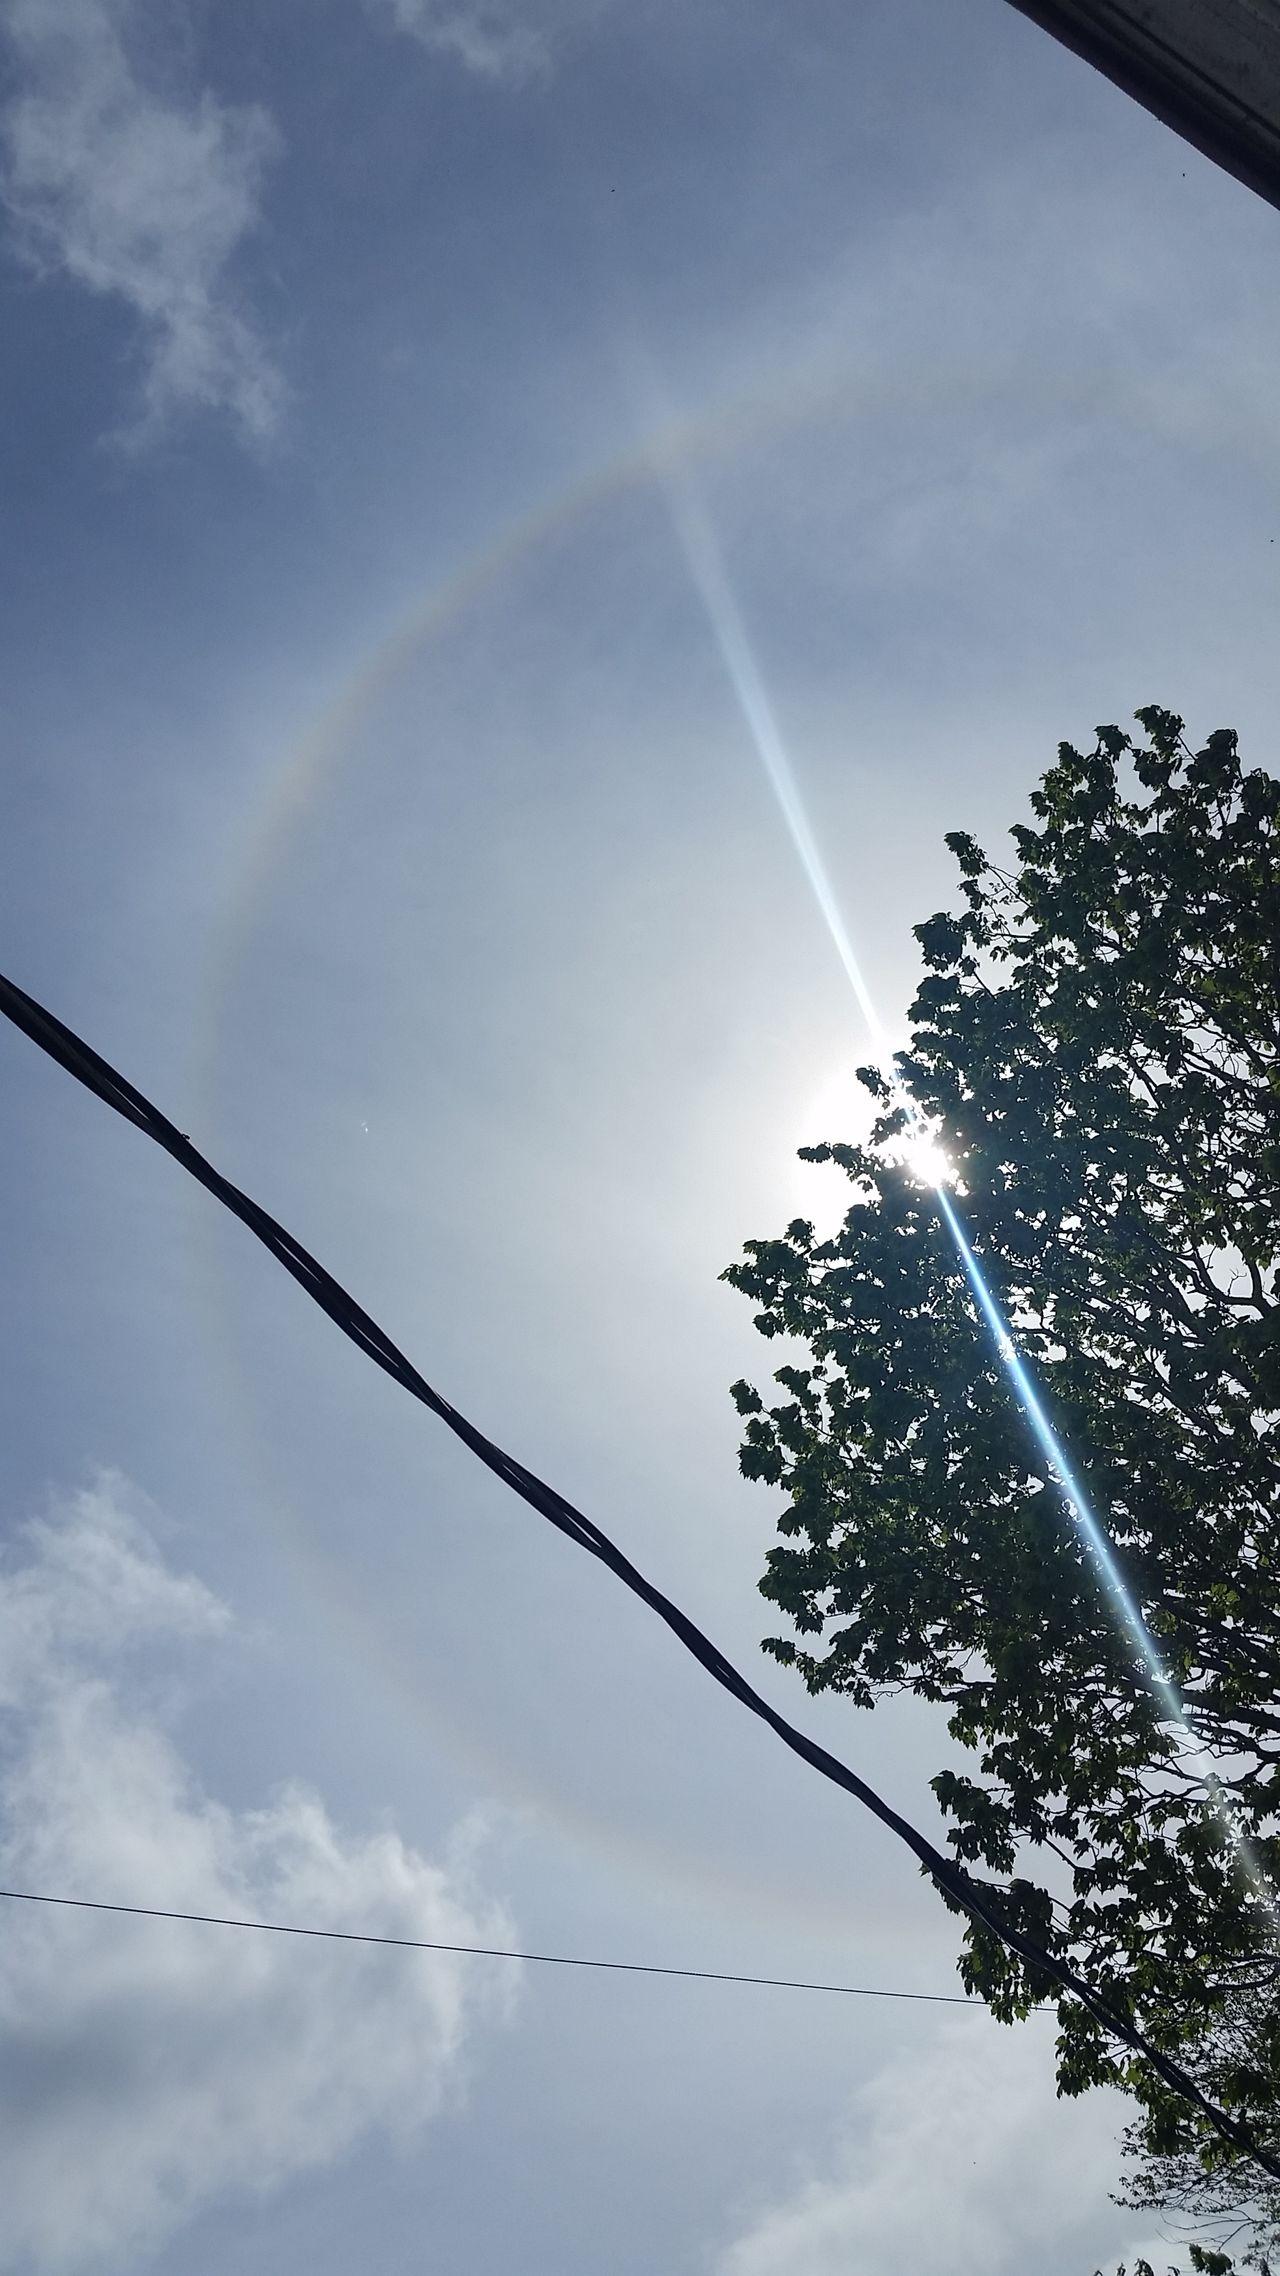 Lookup Sky Raimbowaroundthesun Angels Gifts Nature Weather